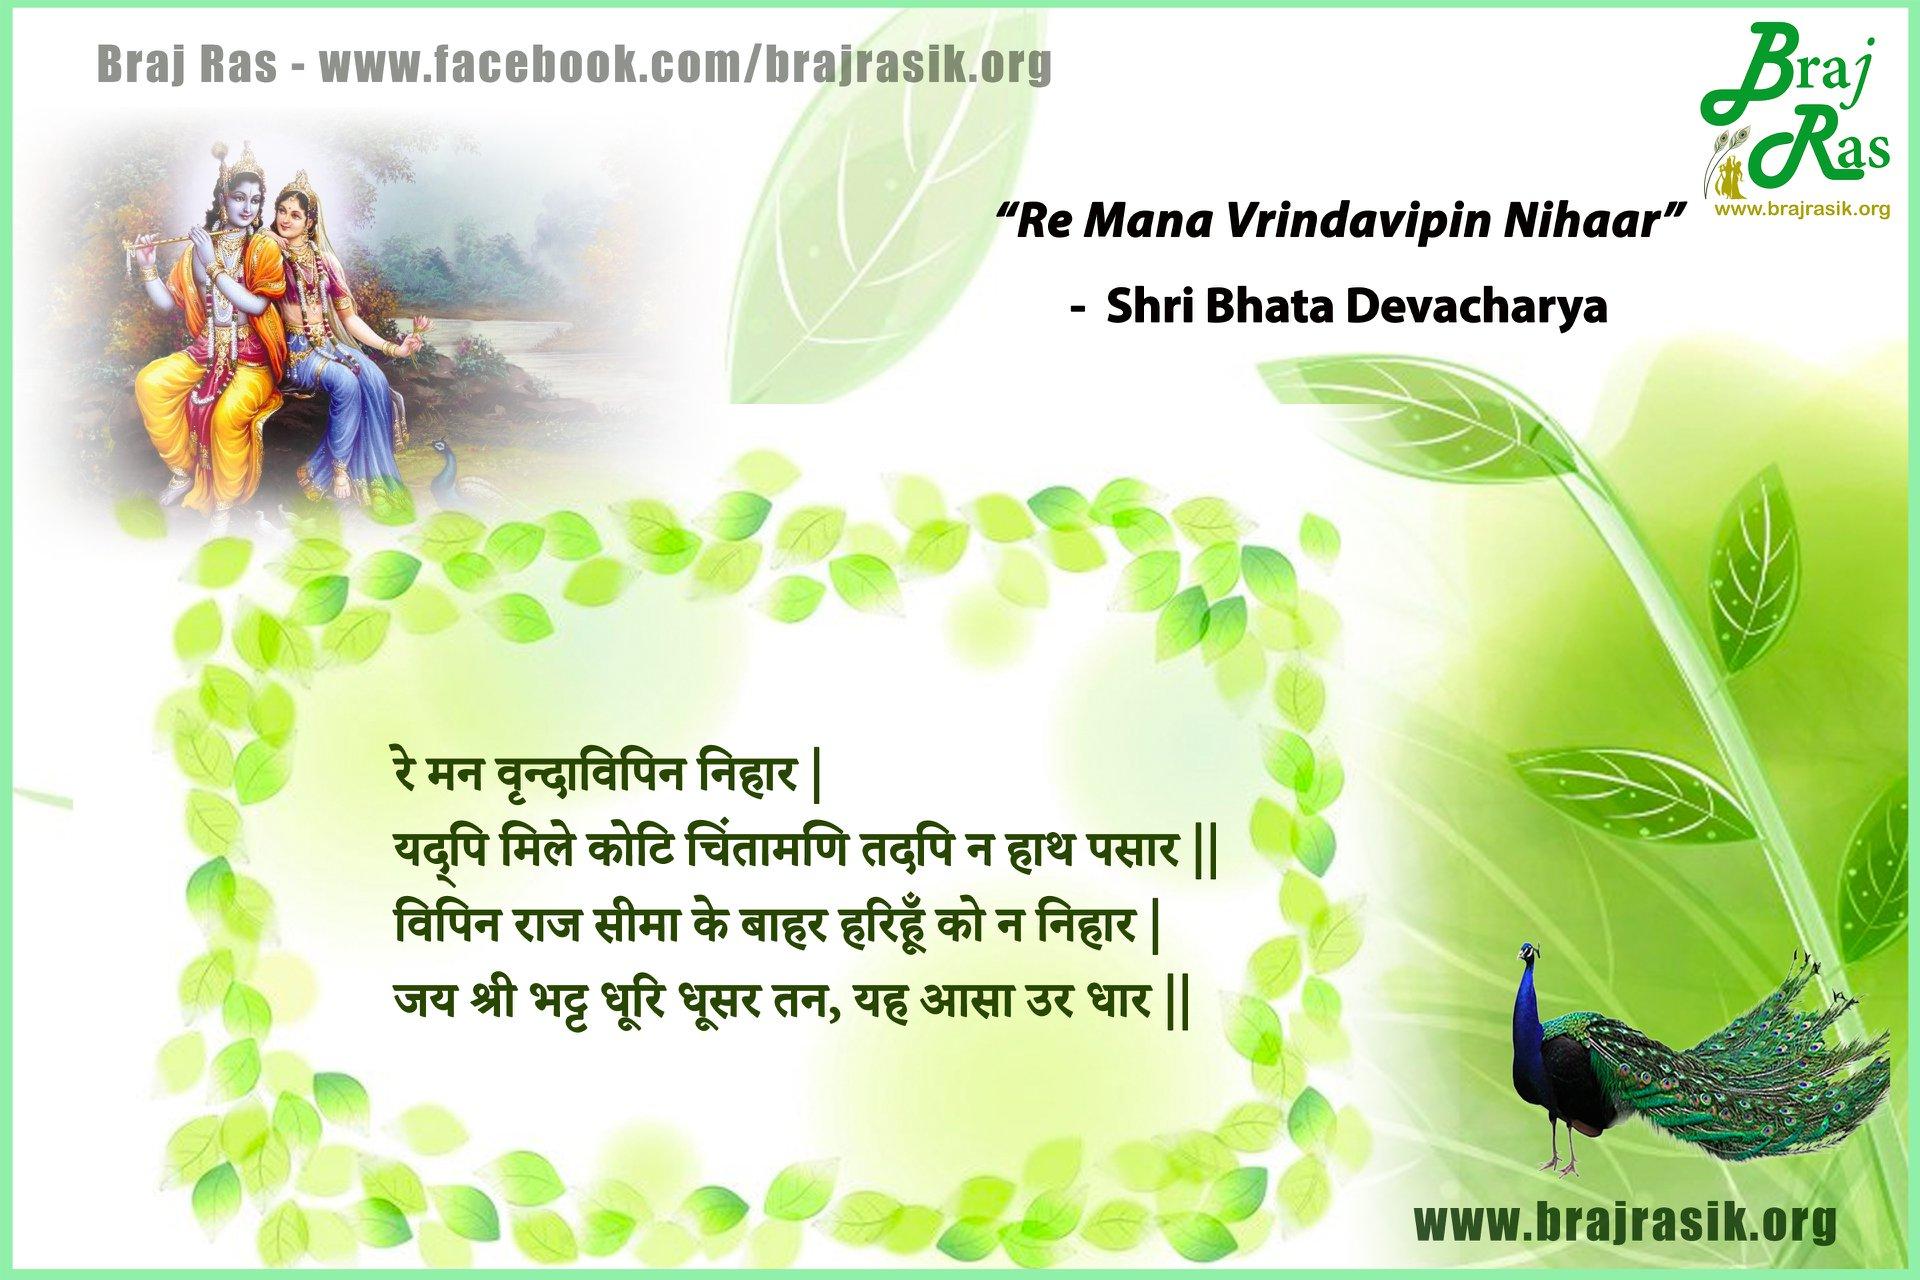 Re Mana Vrindavipin Nihaar - Shri Bhata Devacharya